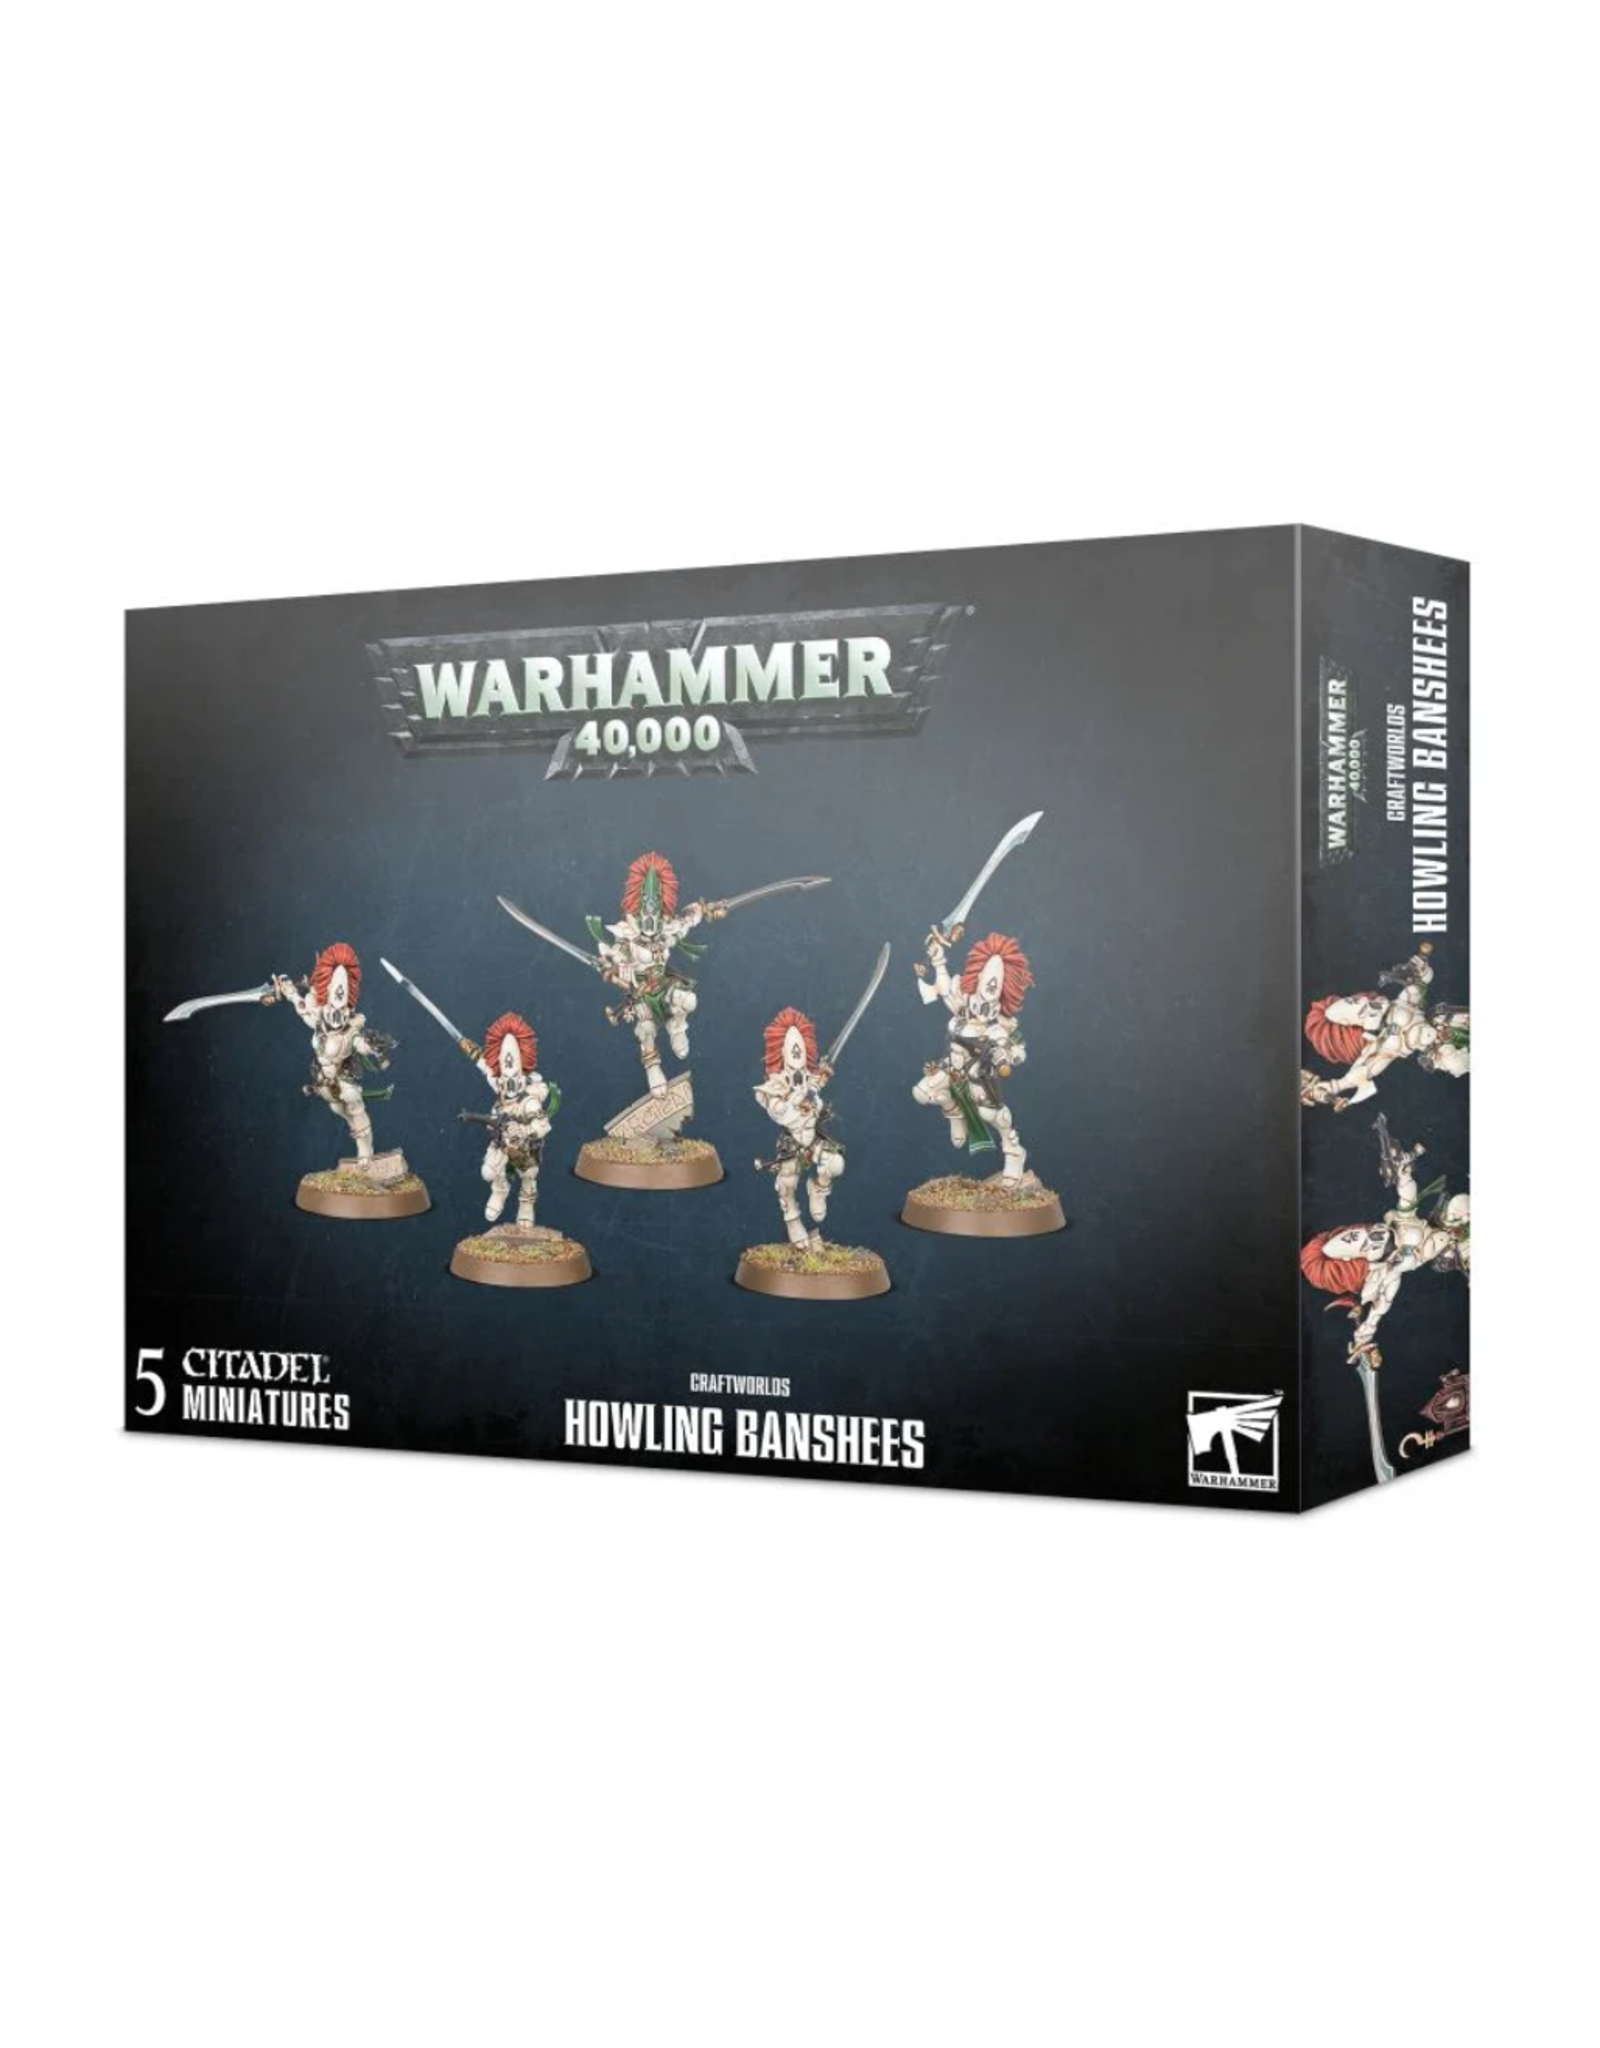 Warhammer 40K Craftworlds Howling Banshees